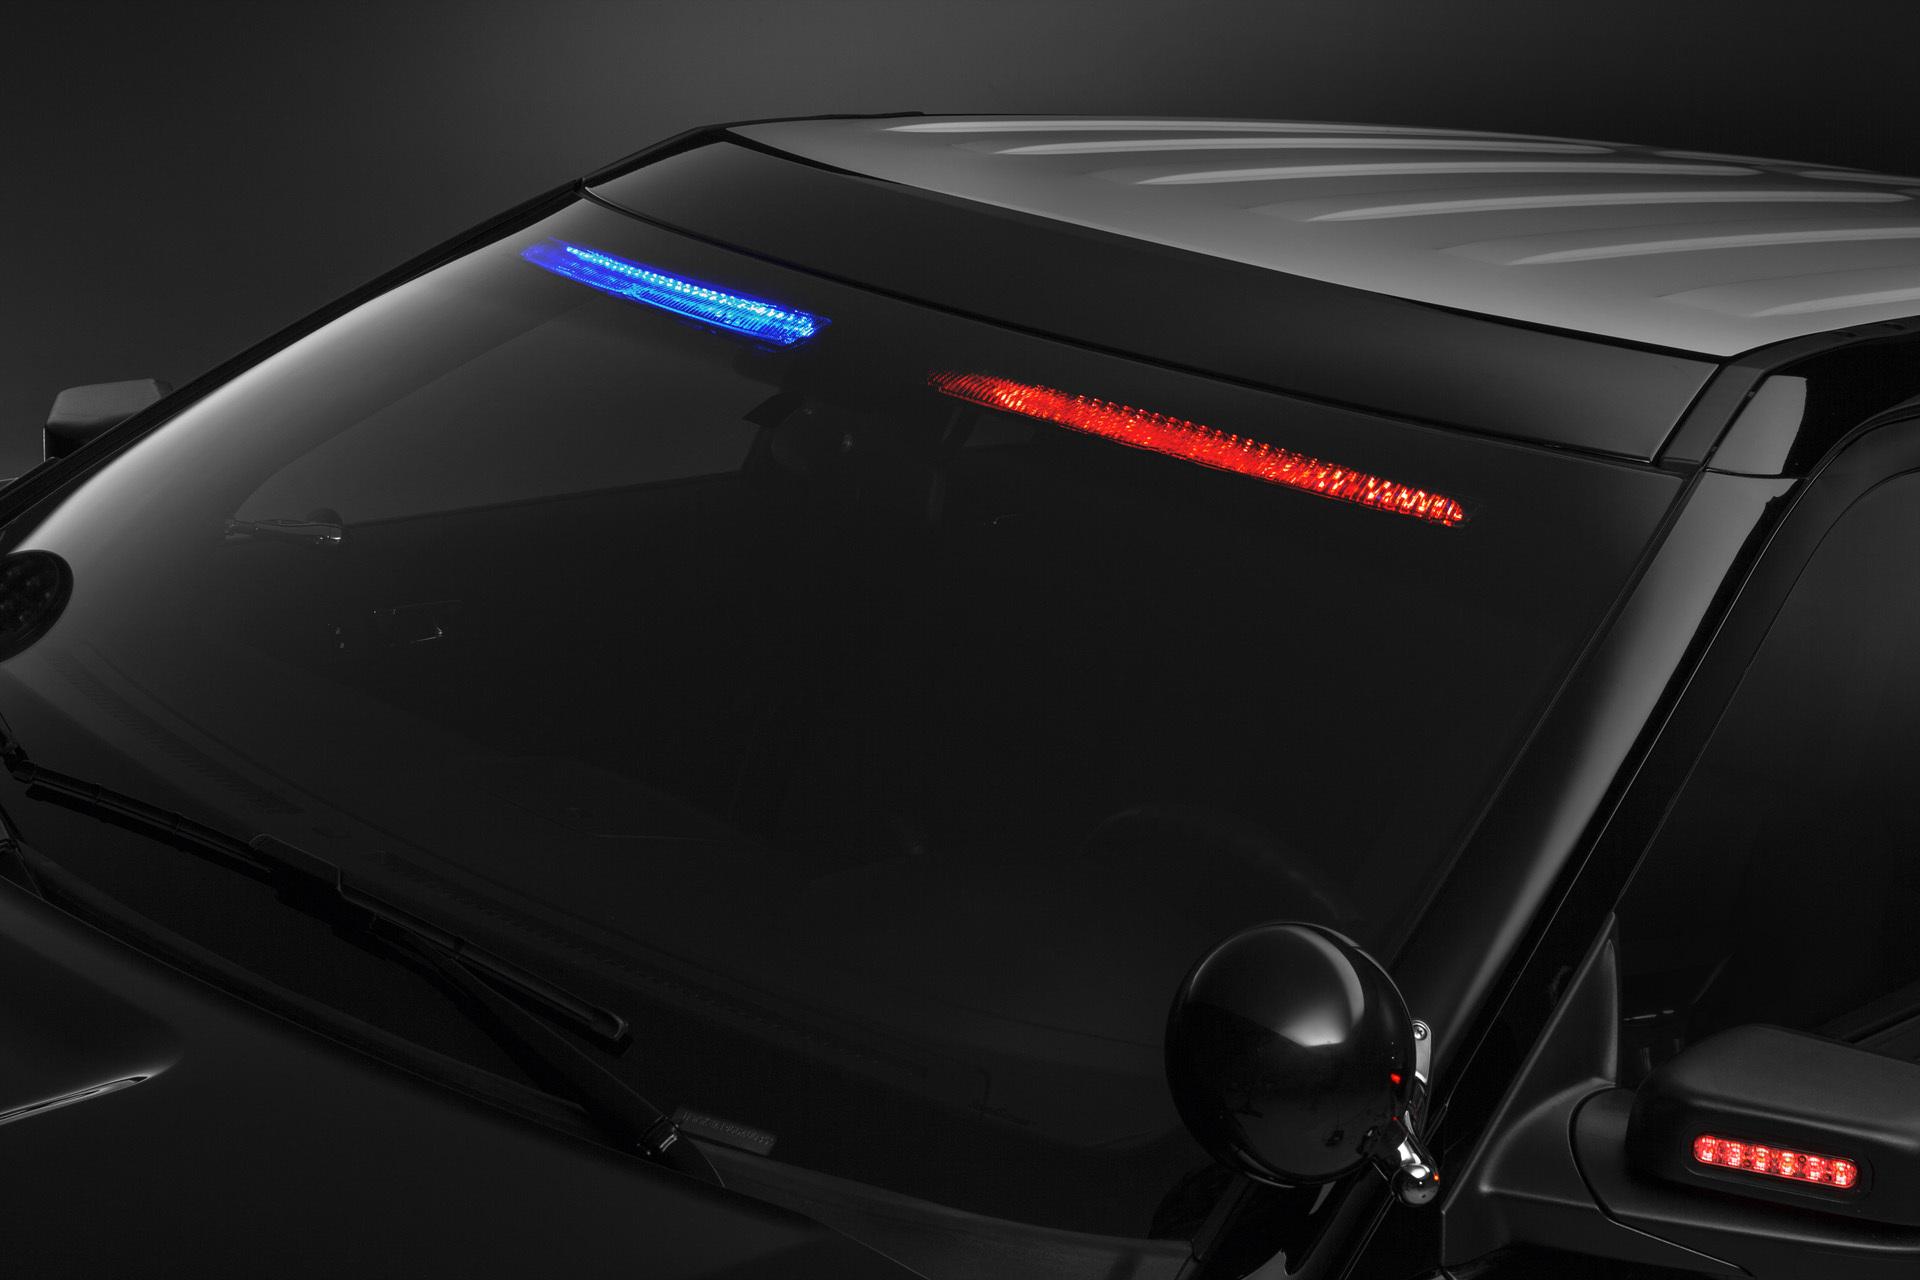 2018 Michigan State Police Vehicle Testing >> Michigan State Police 2015 Vehicle Test Dates.html   Autos Post